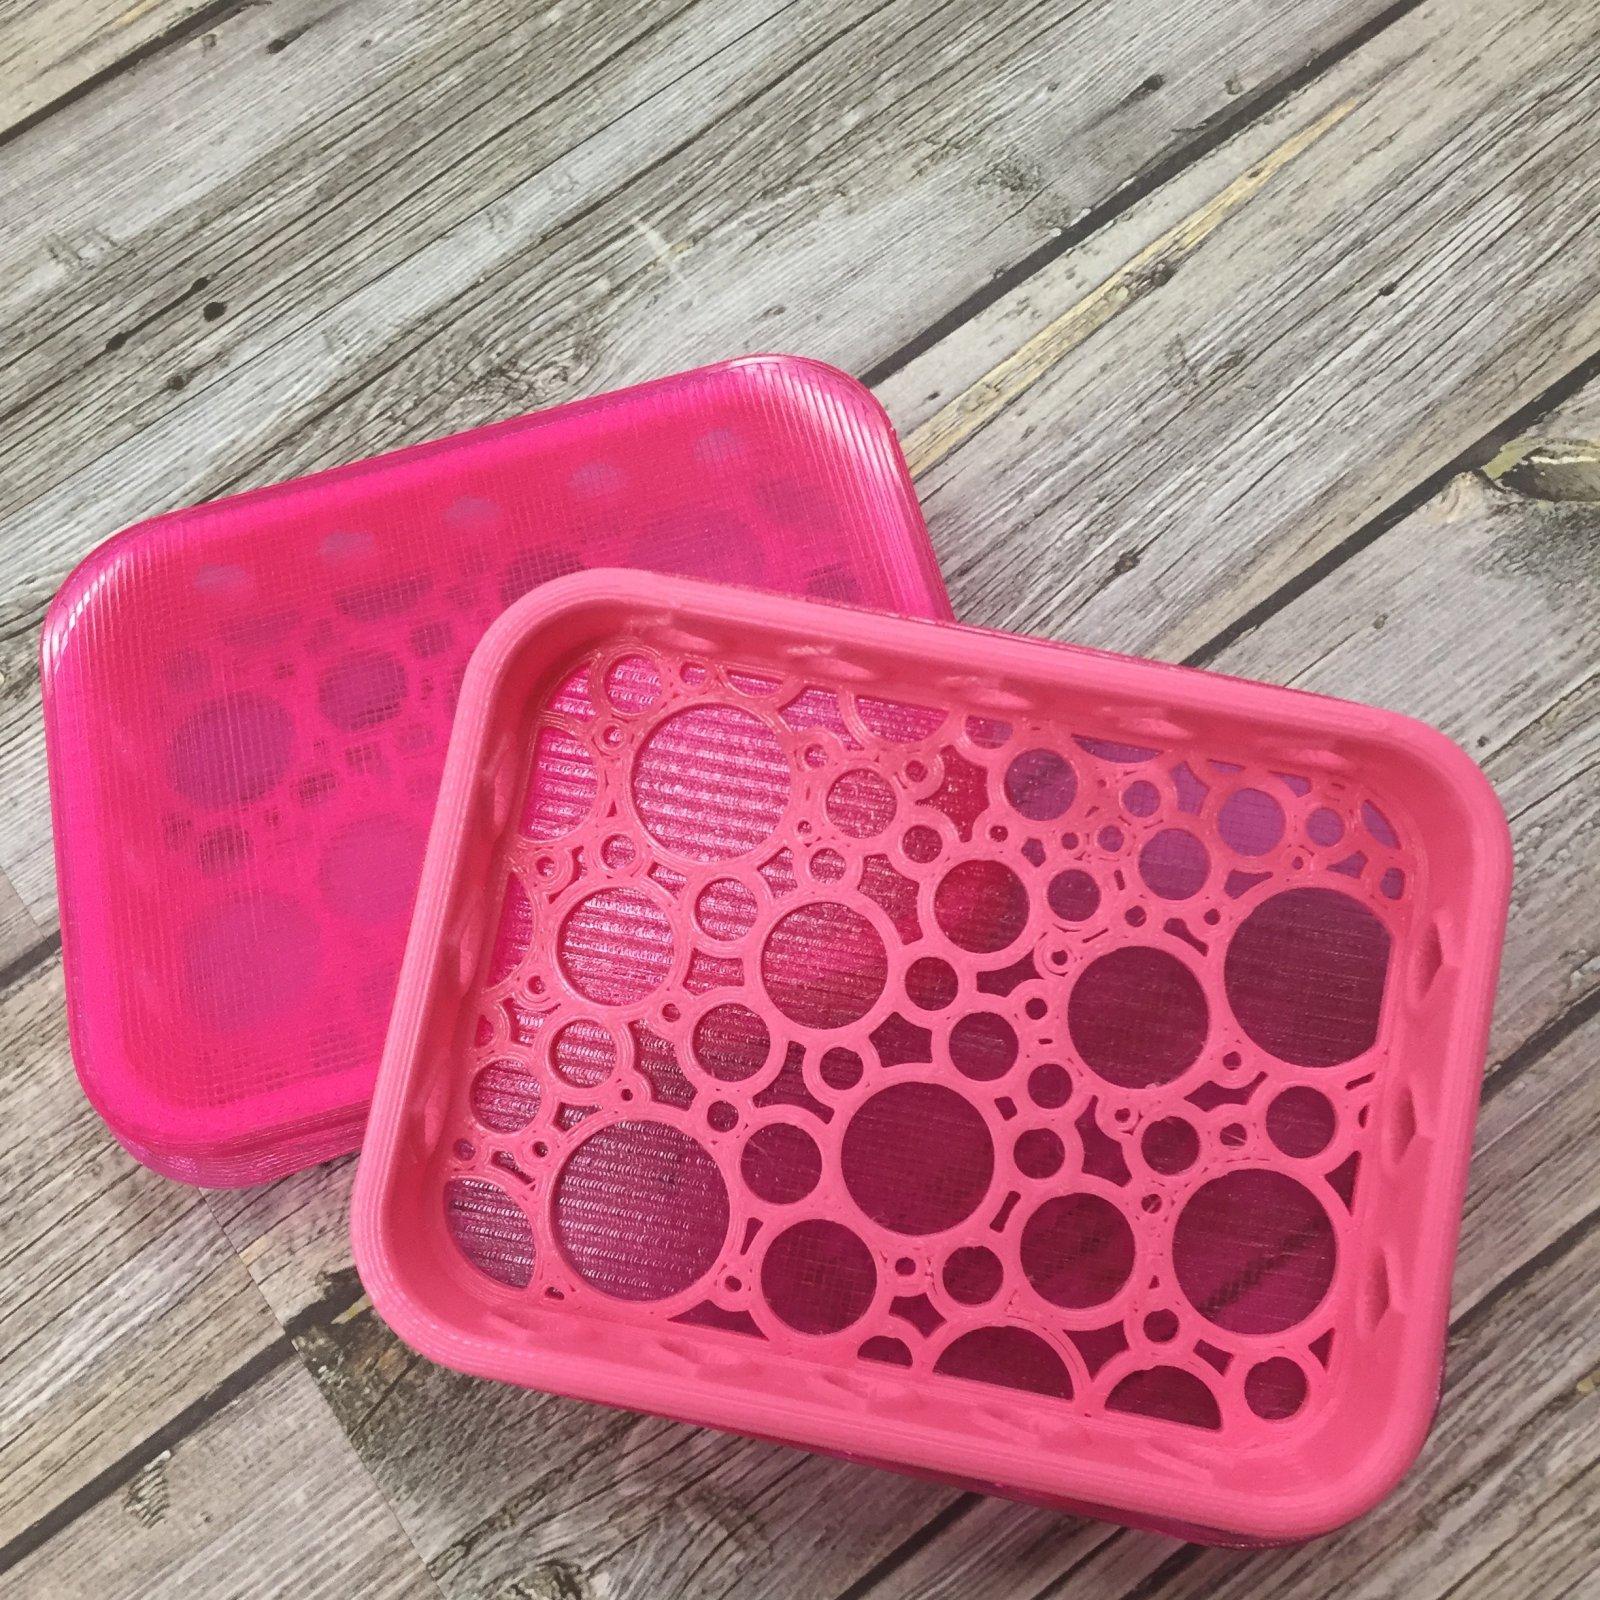 Stamp Shammy Case - Pink, Bubble